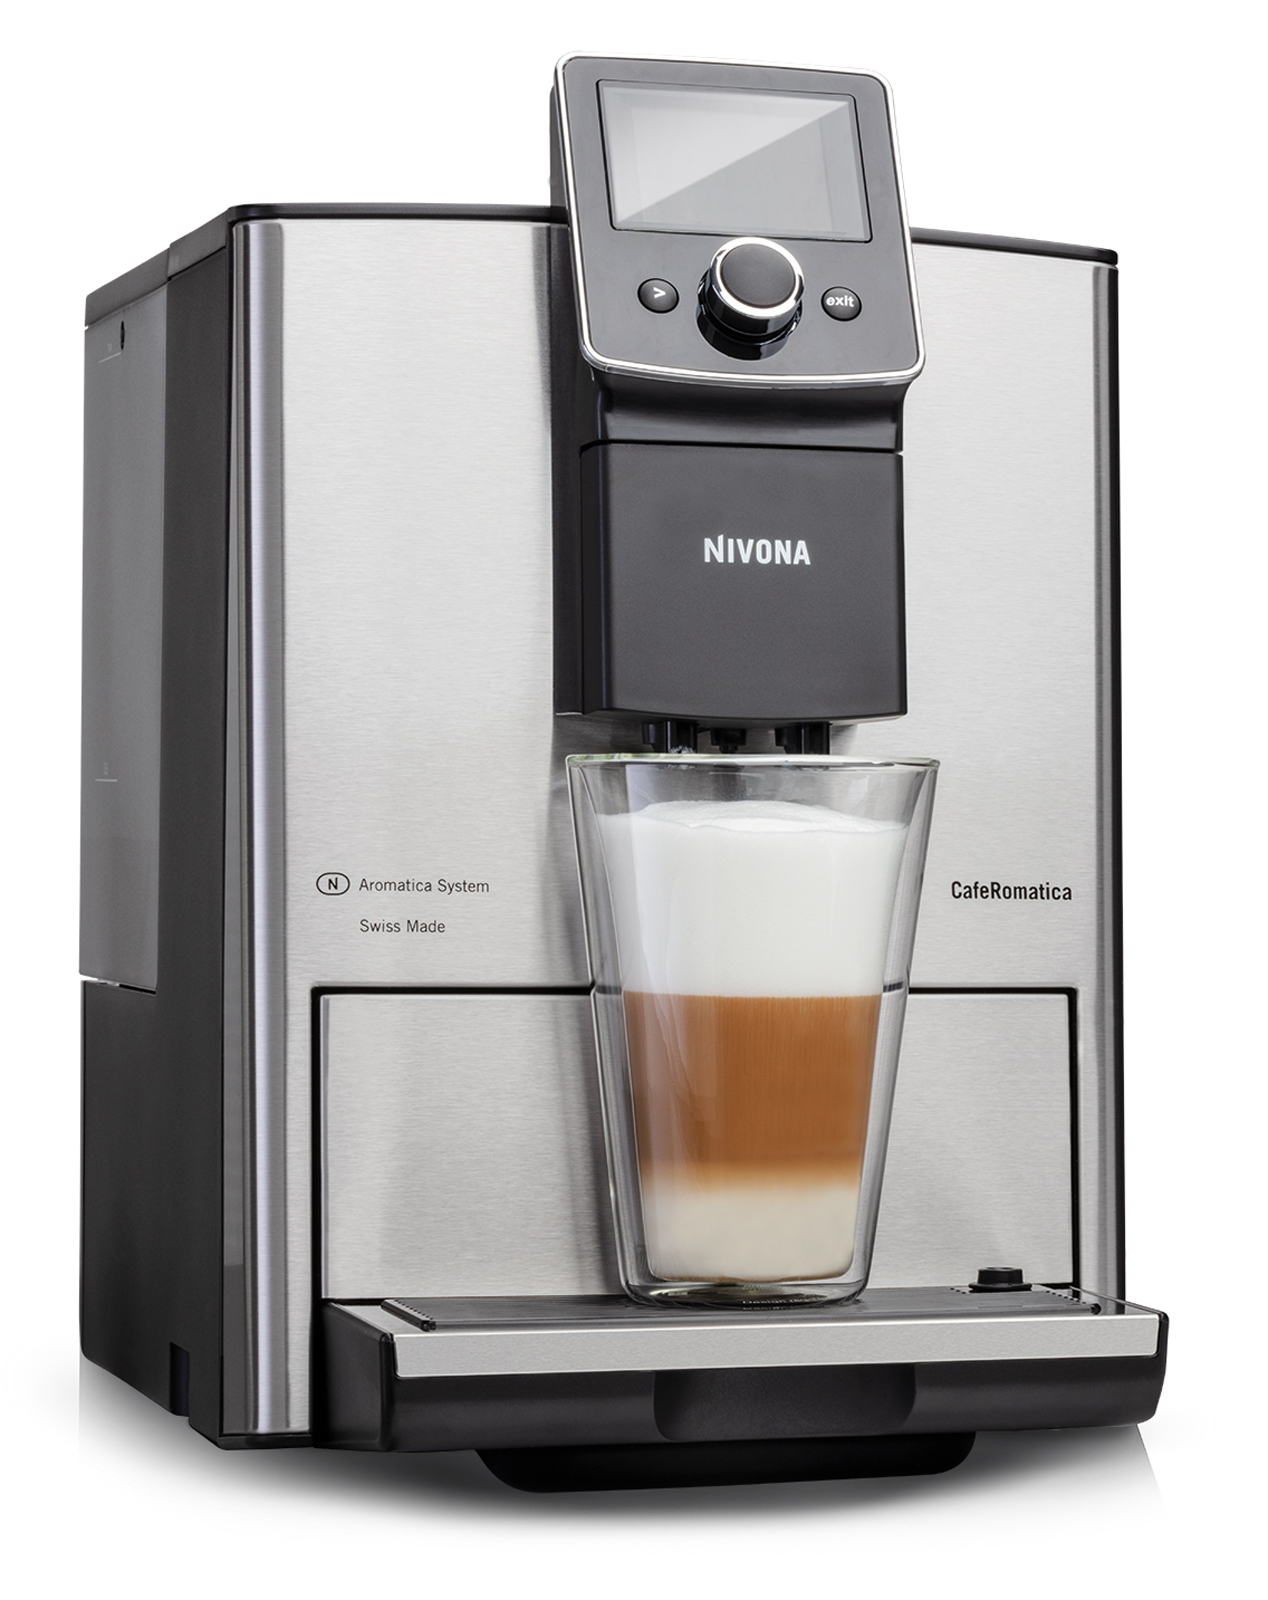 <h1>Nivona Kaffeevollautomat NICR 825</h1><h3 style='font-size: 20px; margin: 0px 0px 15px 0px;'> -2 Modelle, verbesserte Ausstattung, Spumatore DUOplus</h3>